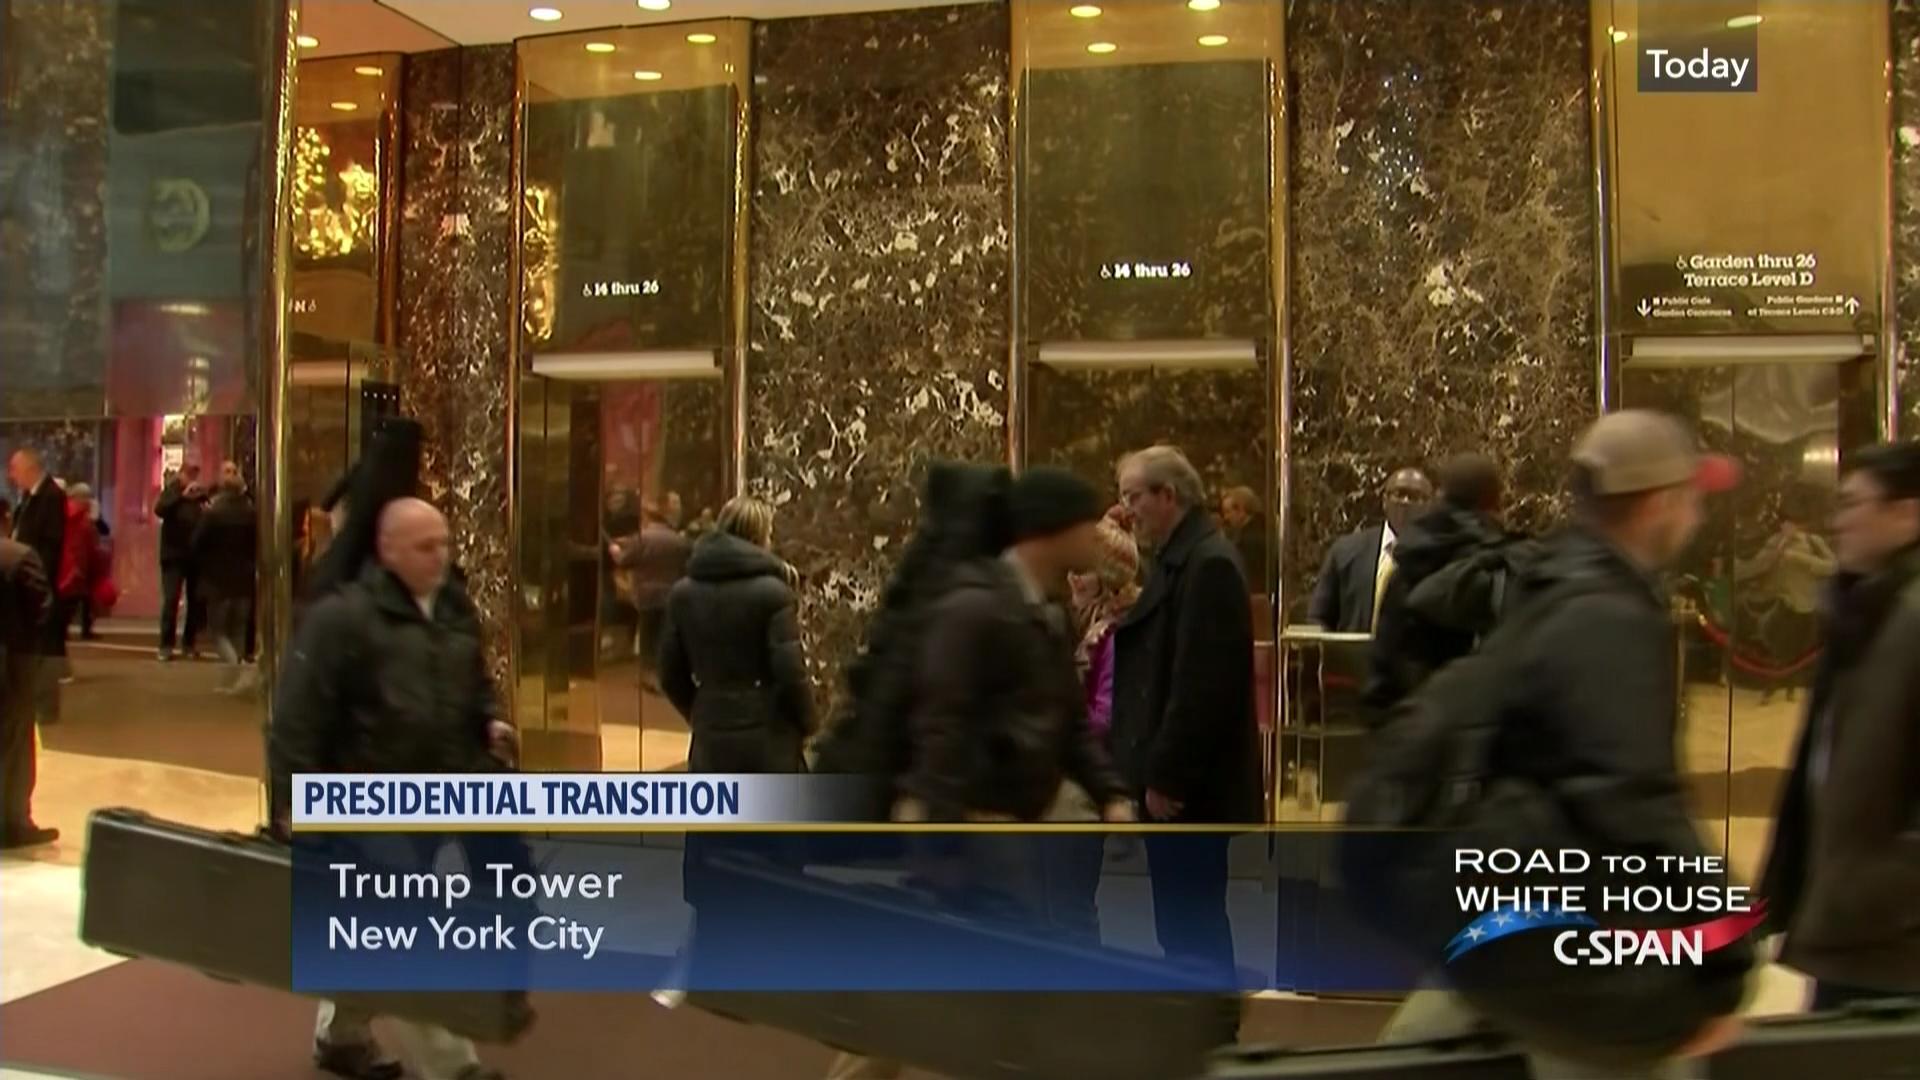 Trump Tower Lobby Pool Feed, Dec 12 2016 | Video | C-SPAN.org